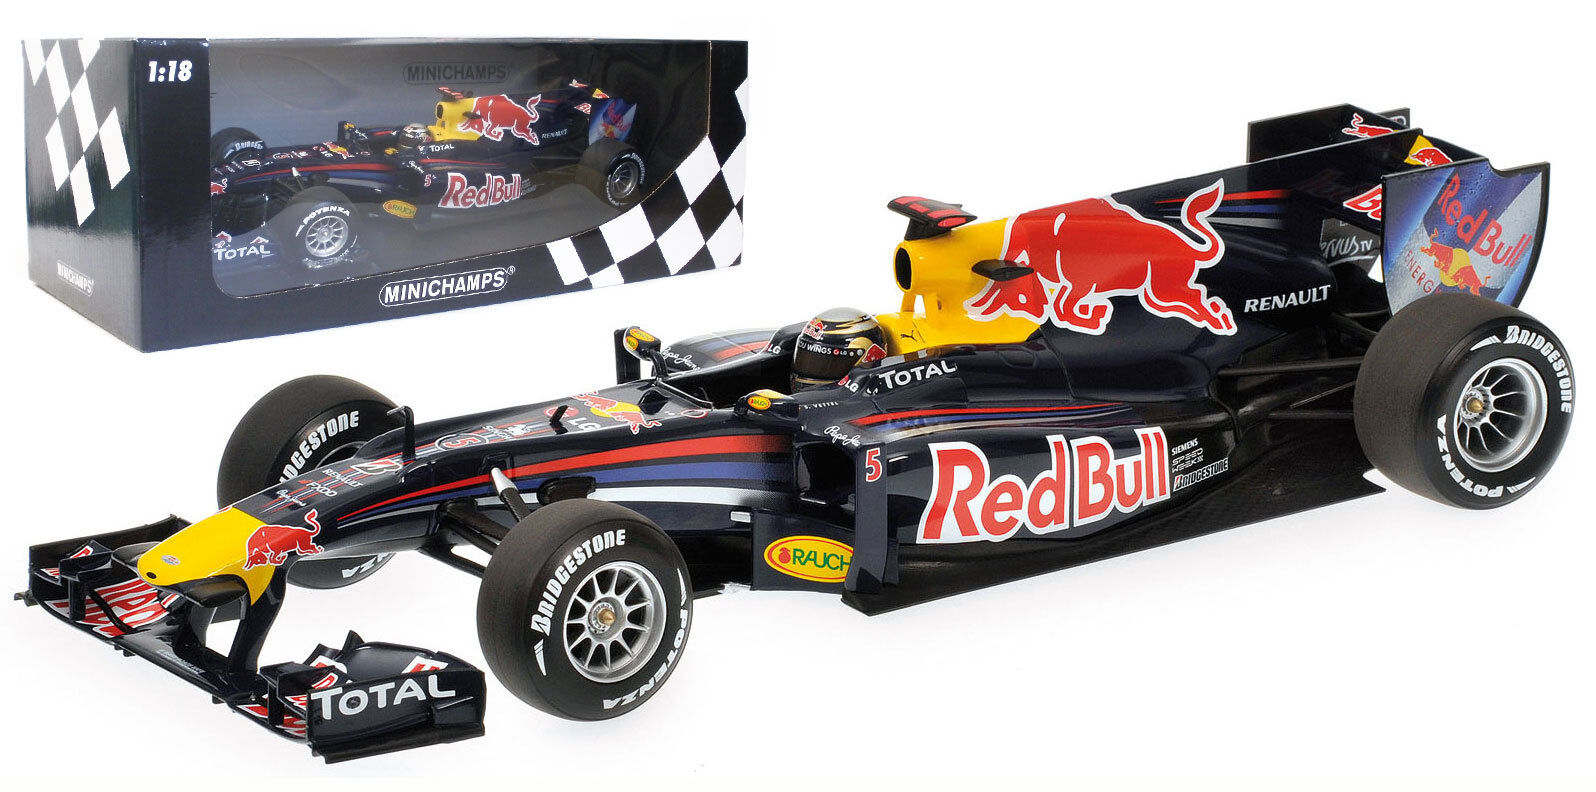 Minichamps Red Bull RB6 2010 - S Vettel 2010 World Champion 1 18 Scale